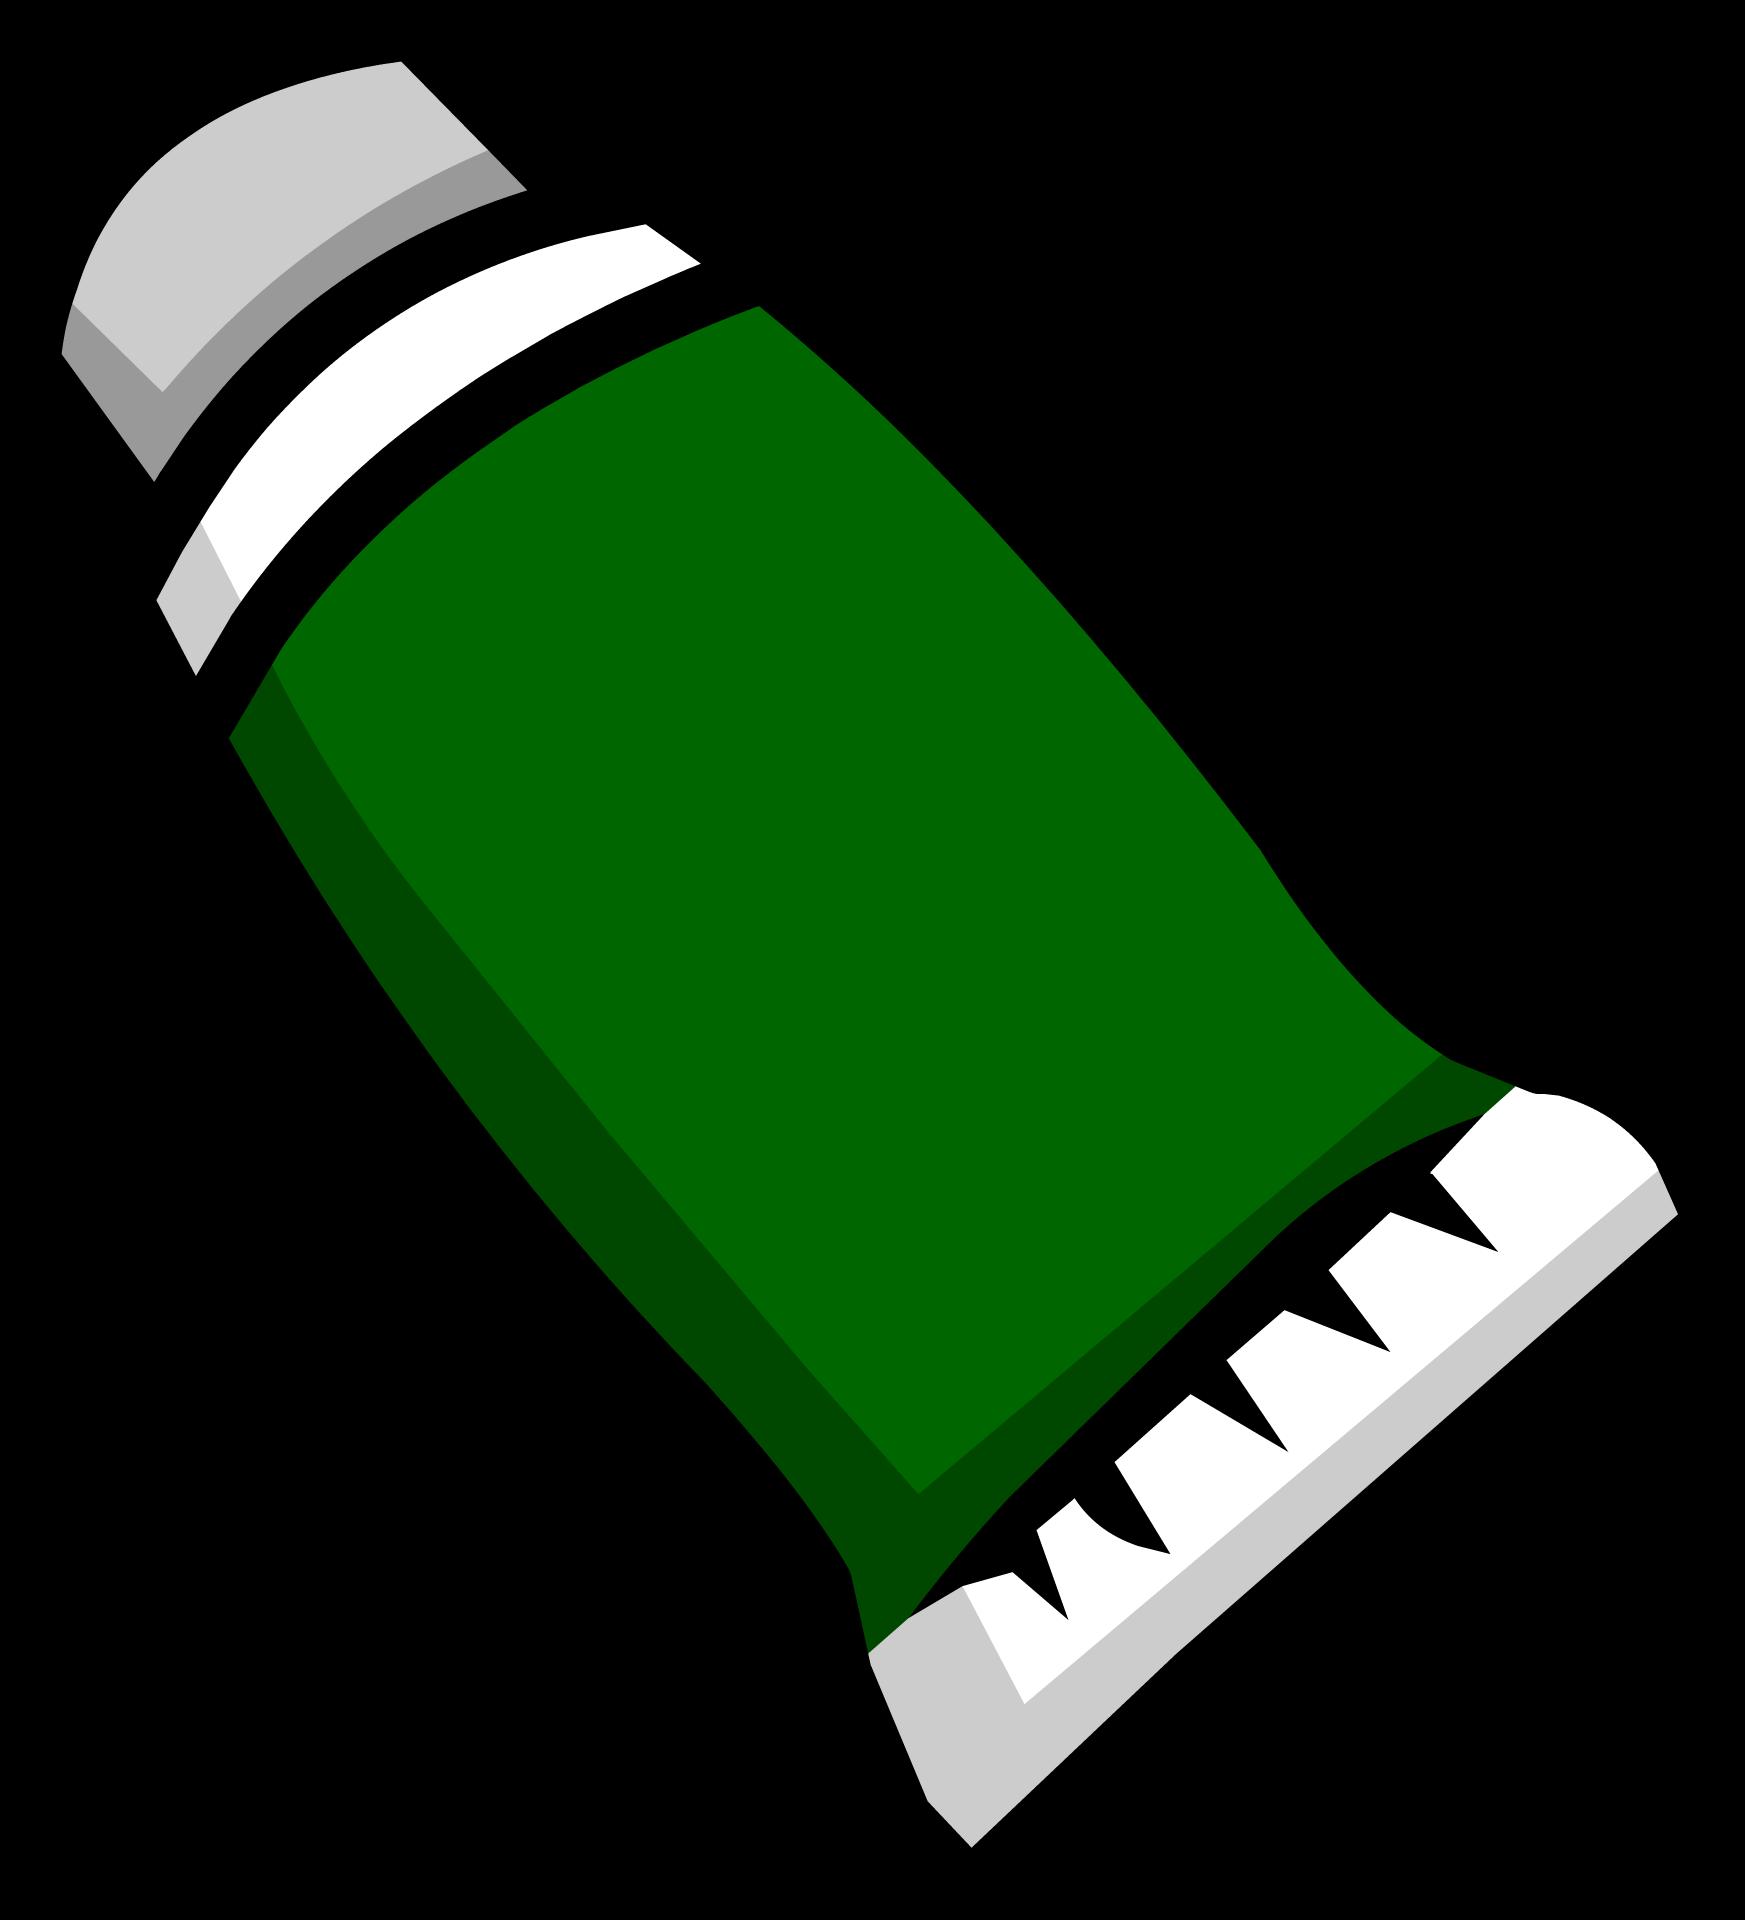 Green Face Paint